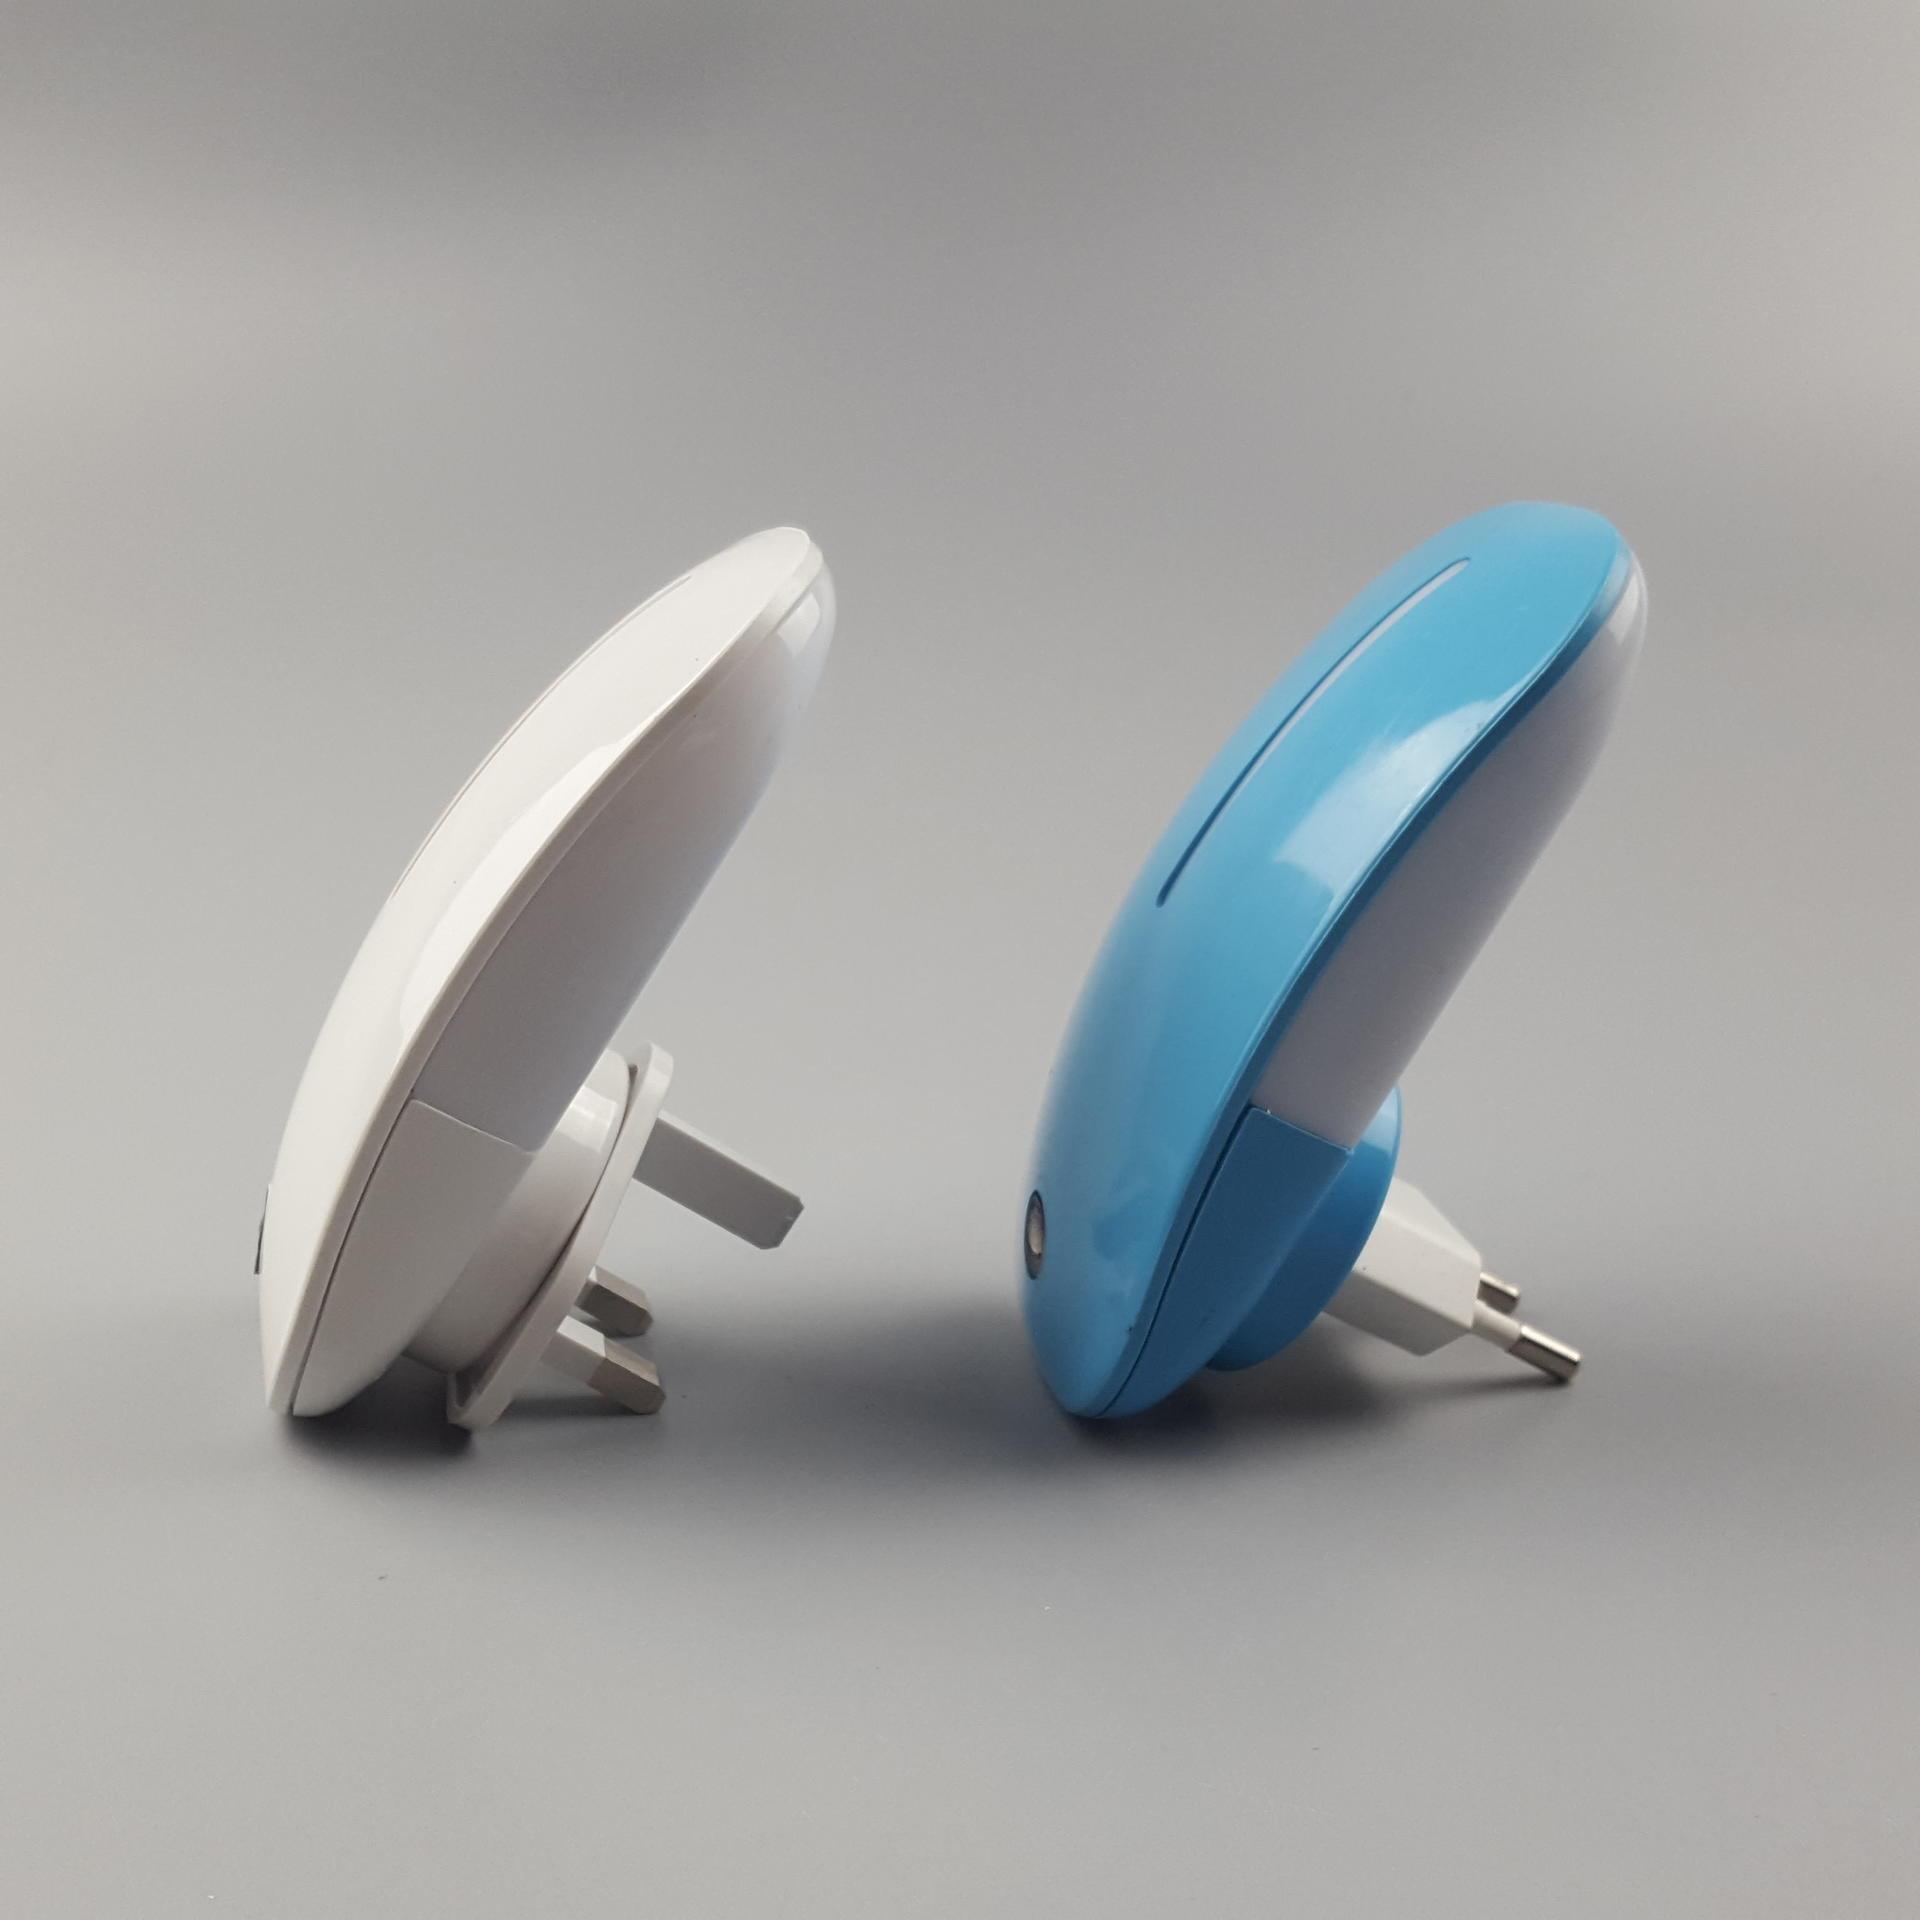 A66 OEM sensor auto control warm white mouse shape CE ROHS CB LED EU UK plug night light for lighting kids